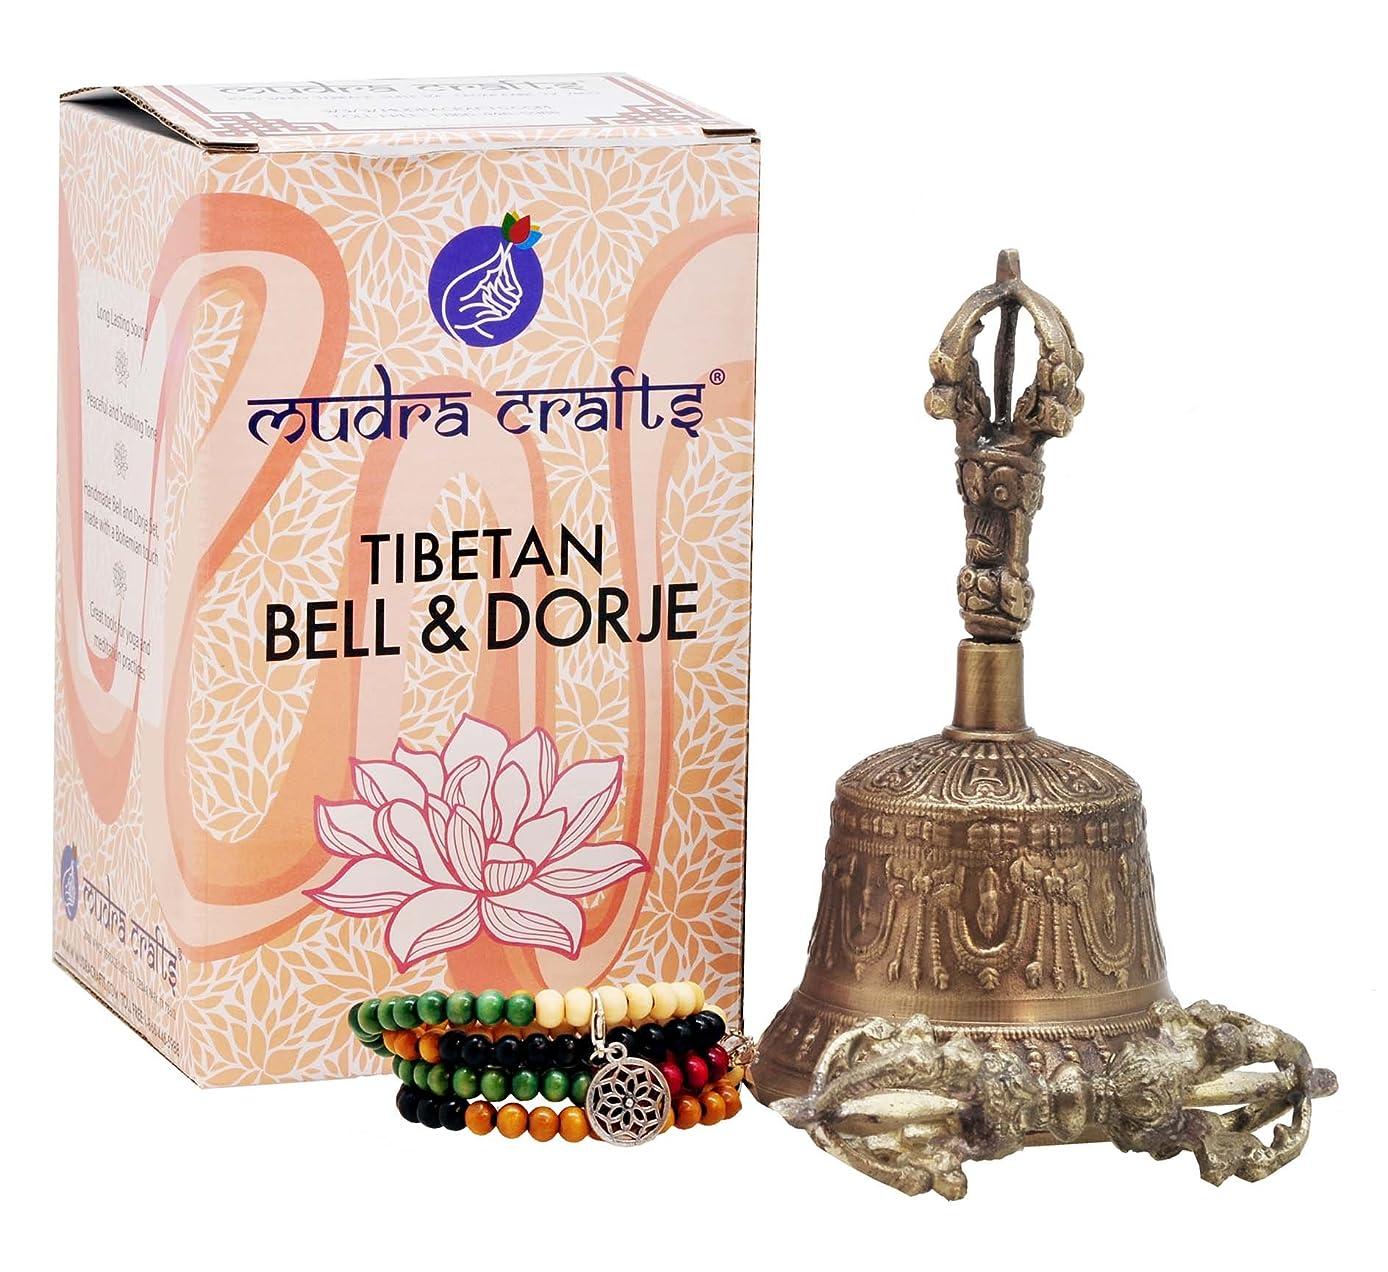 Mudra Crafts Tibetan Buddhist Handmade Meditation Altar Ritual Yoga Vajra Bell Dorje Set, Wood Prayer Beads with a Mandala Charm (Small, Traditional Engraving)